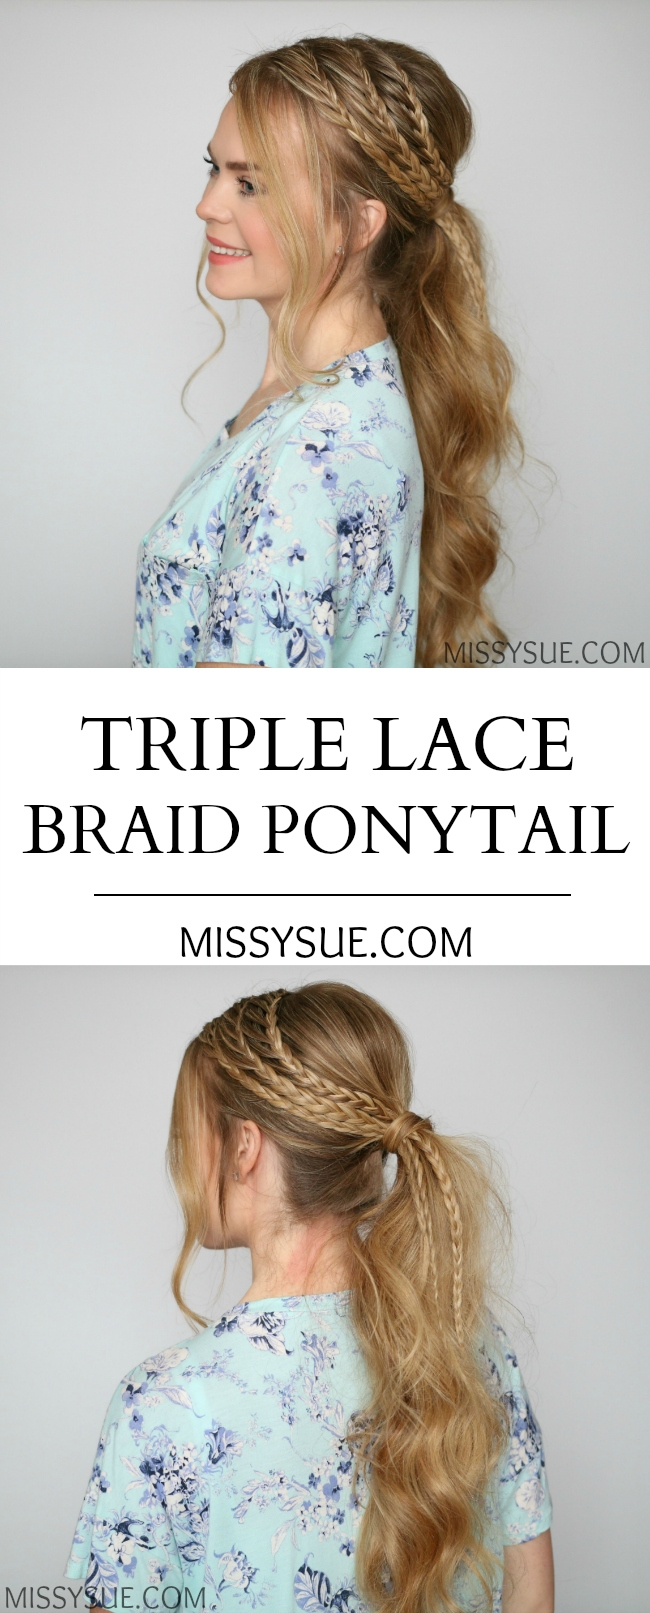 Triple Lace Braid Ponytail